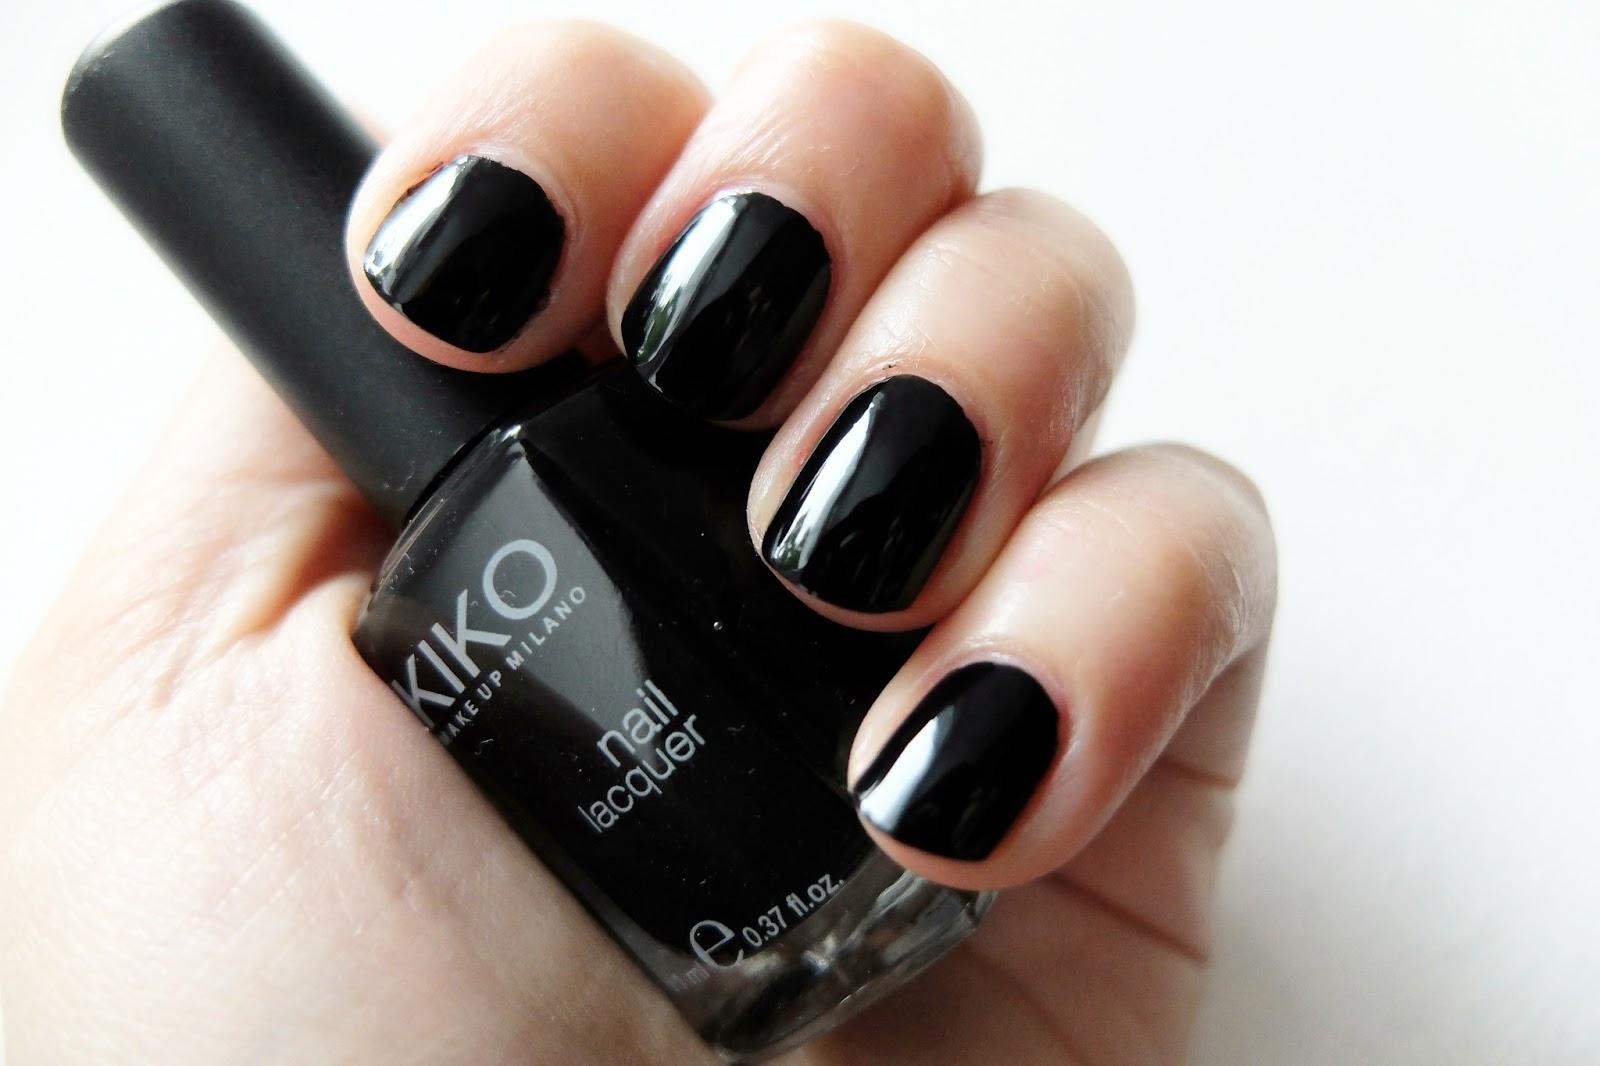 Vernis noir